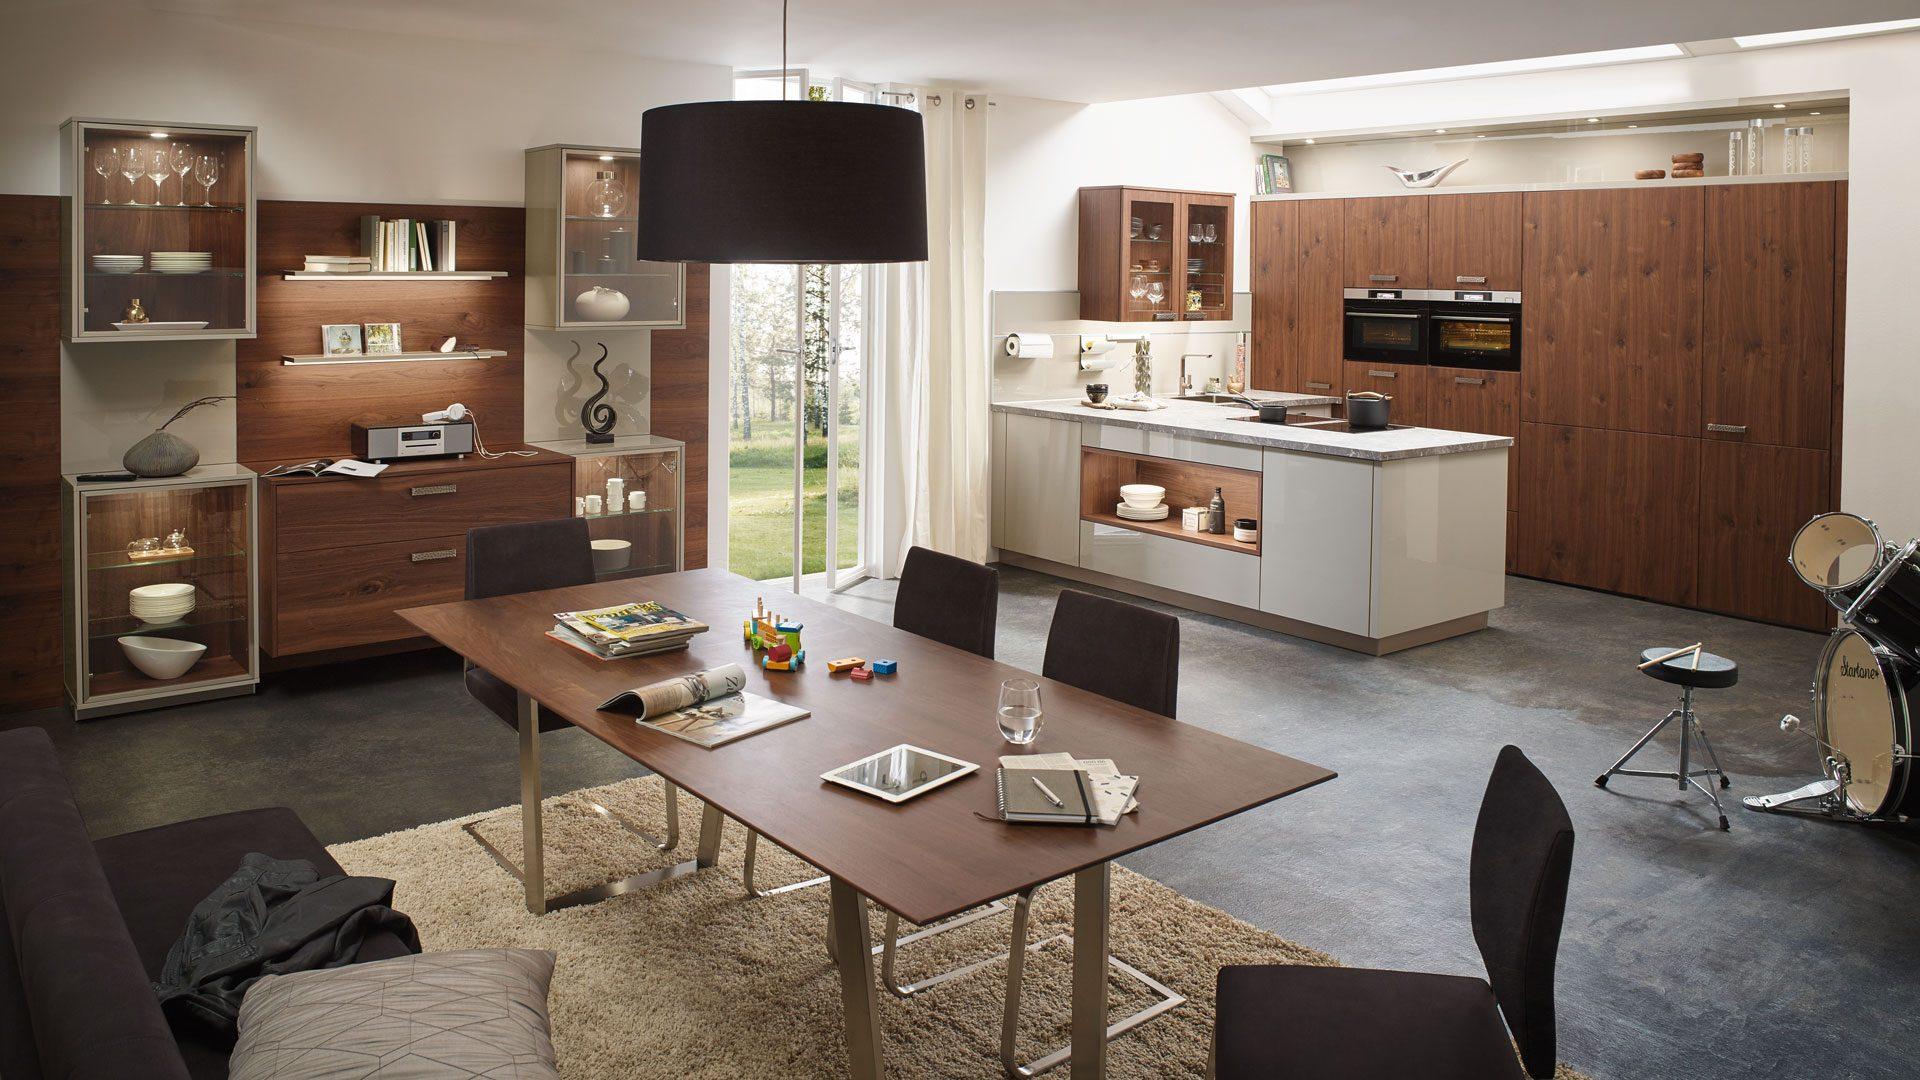 Кухня гостиная минск.jpg